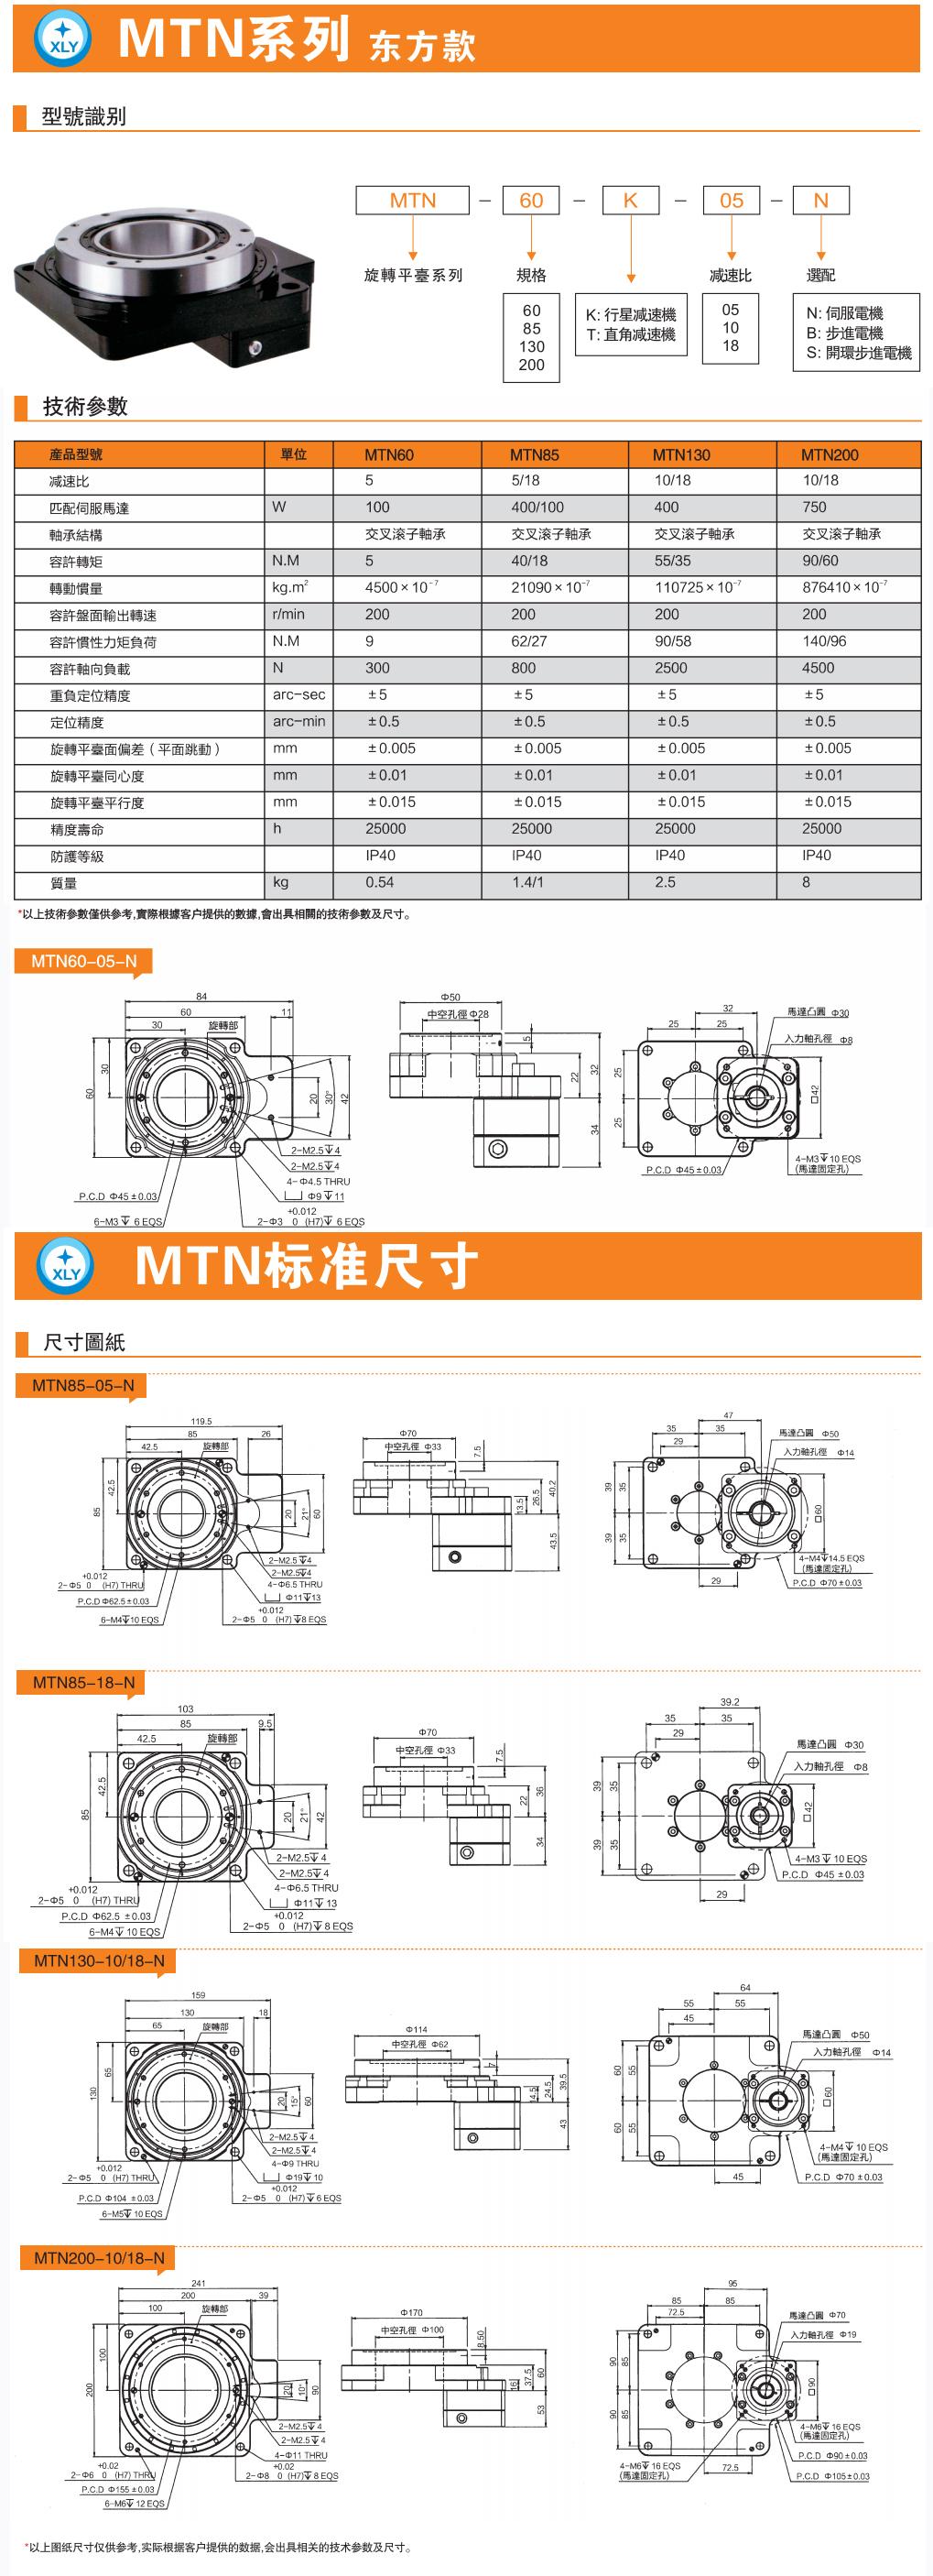 MTN.jpg